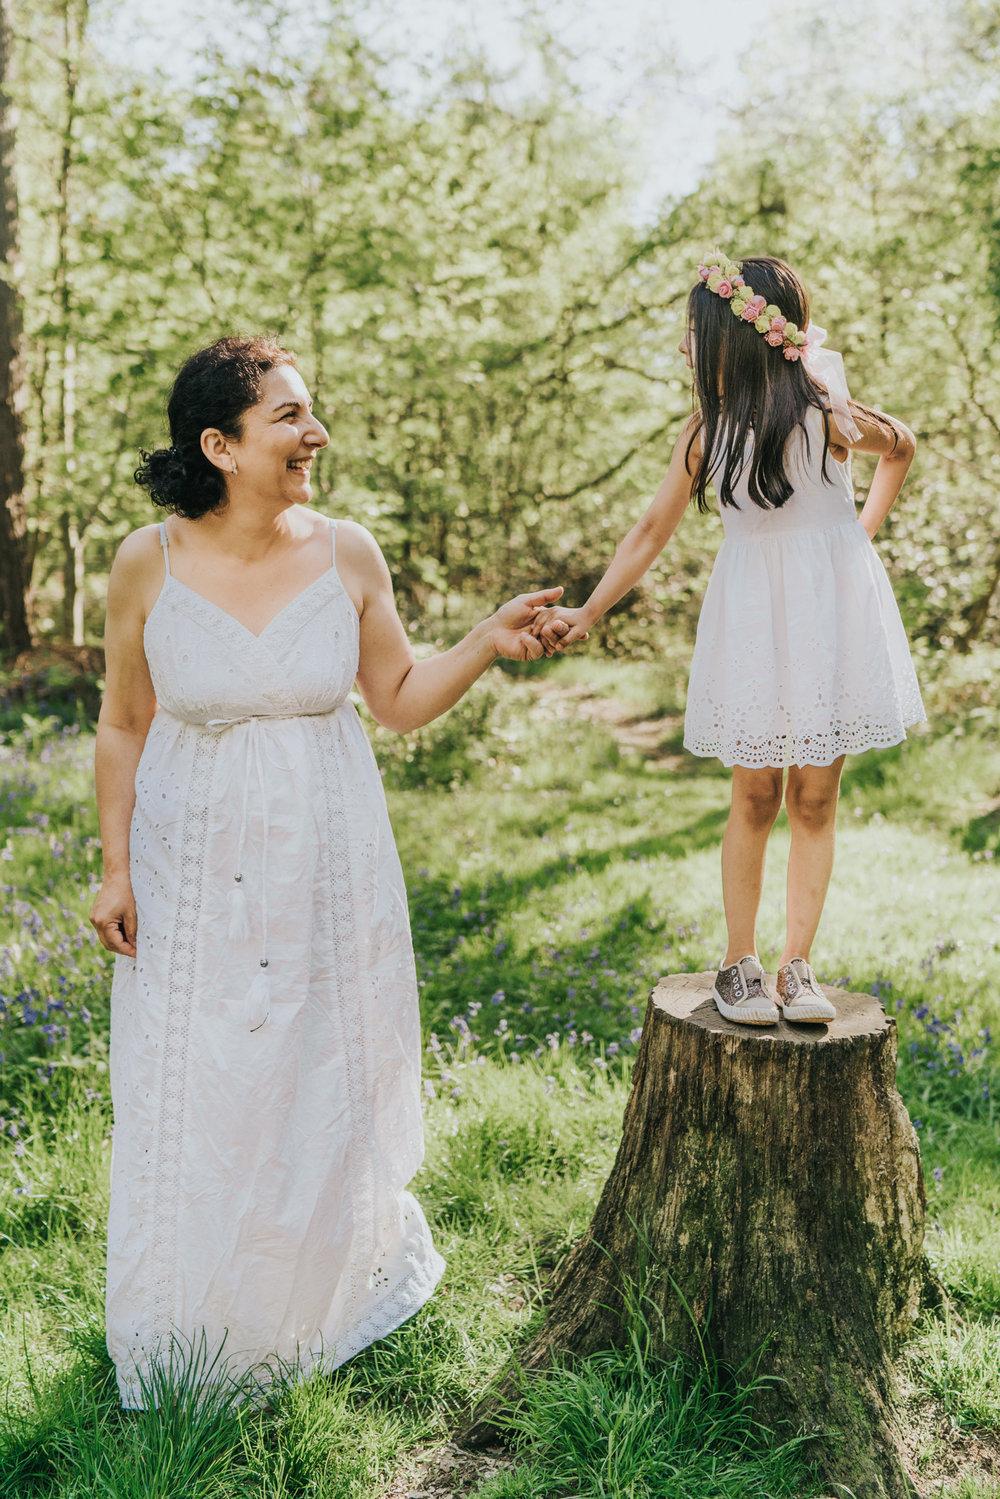 Chandrasiri-Family-Session-Woodland-Colchester-Essex-Grace-Elizabeth-Alternative-Wedding-Photographer (1 of 1).jpg (30 of 34).jpg